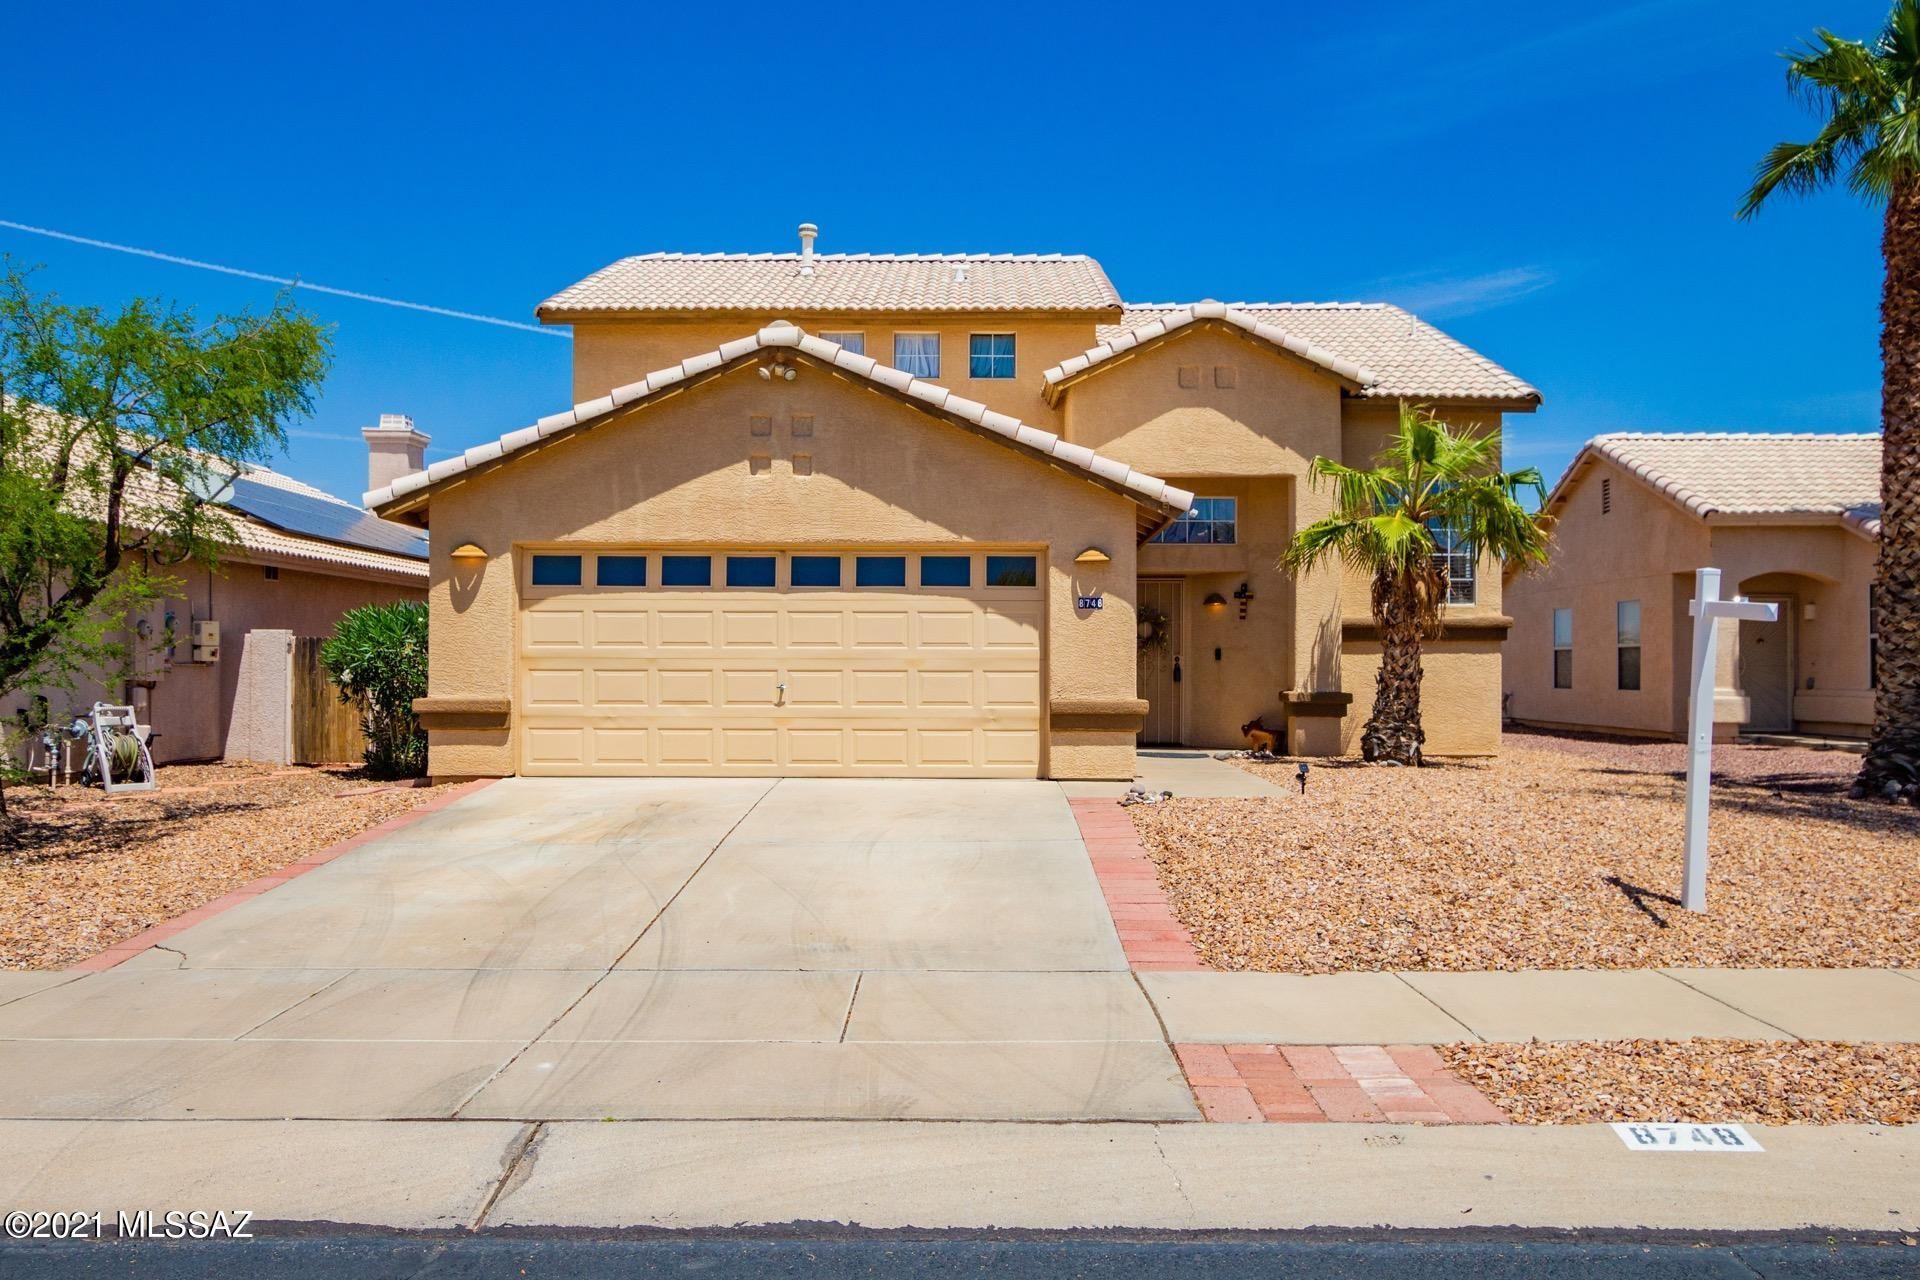 8748 N Sayante Way, Tucson, AZ 85743 - MLS#: 22111955